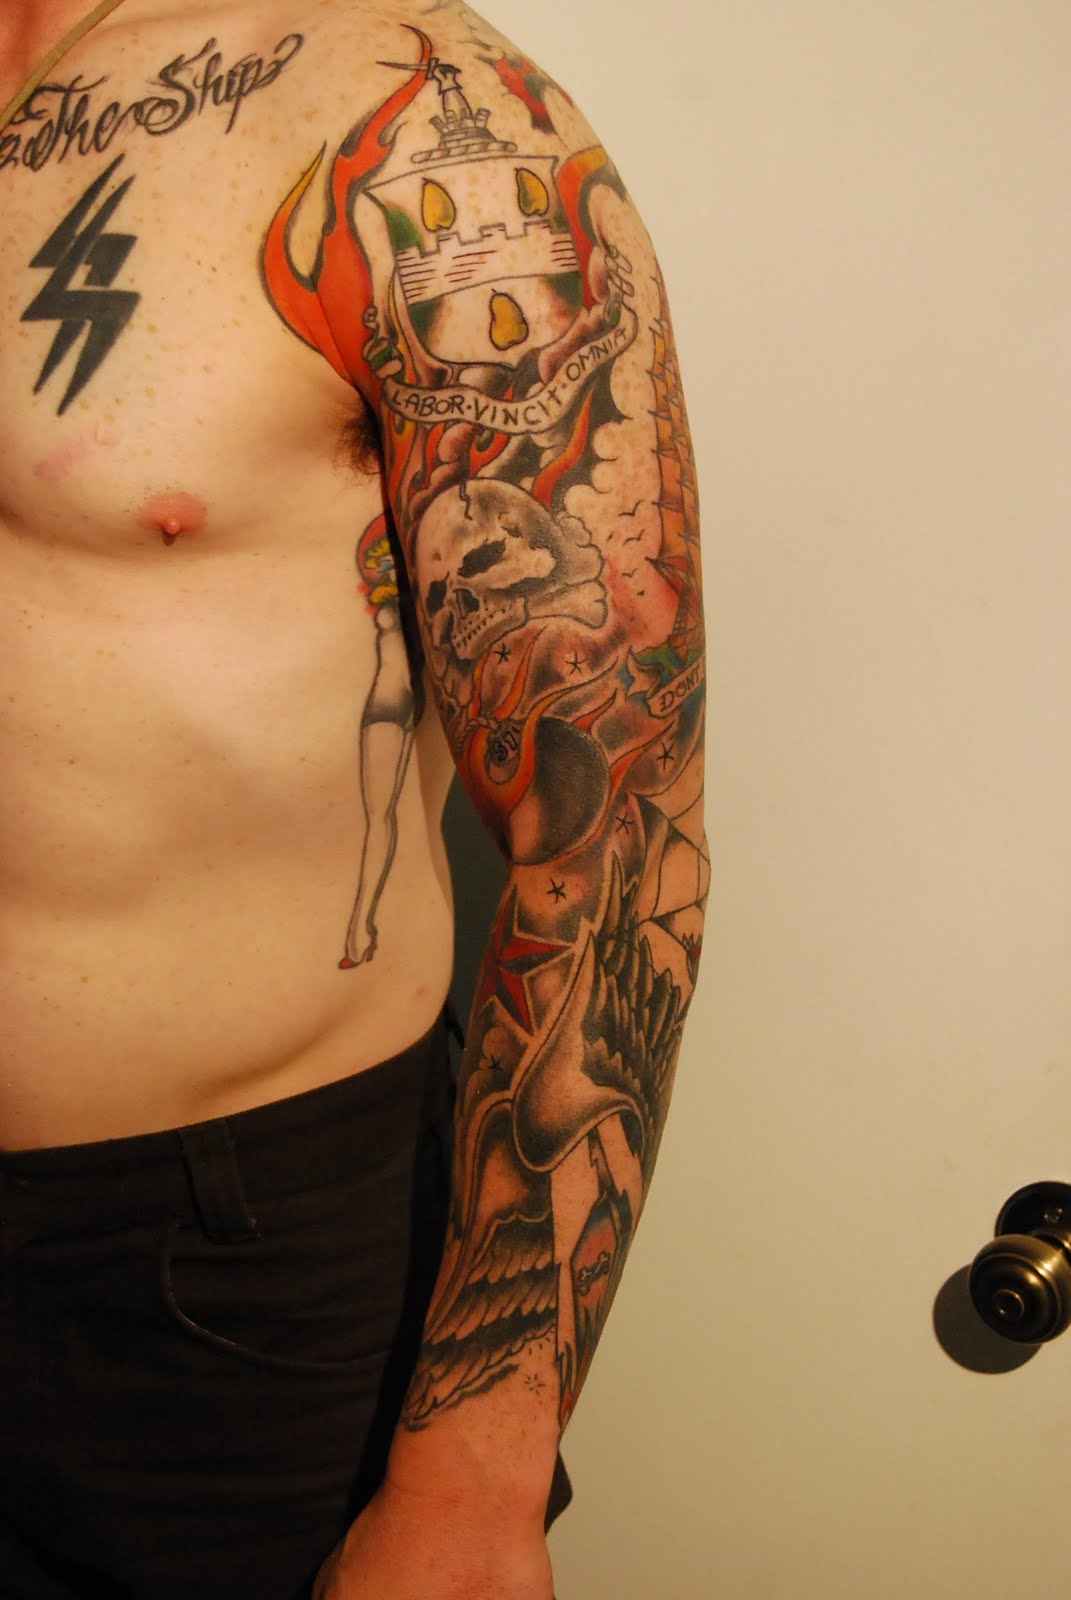 Little C's Tattoo Parlor: Halloween week new tattoos!